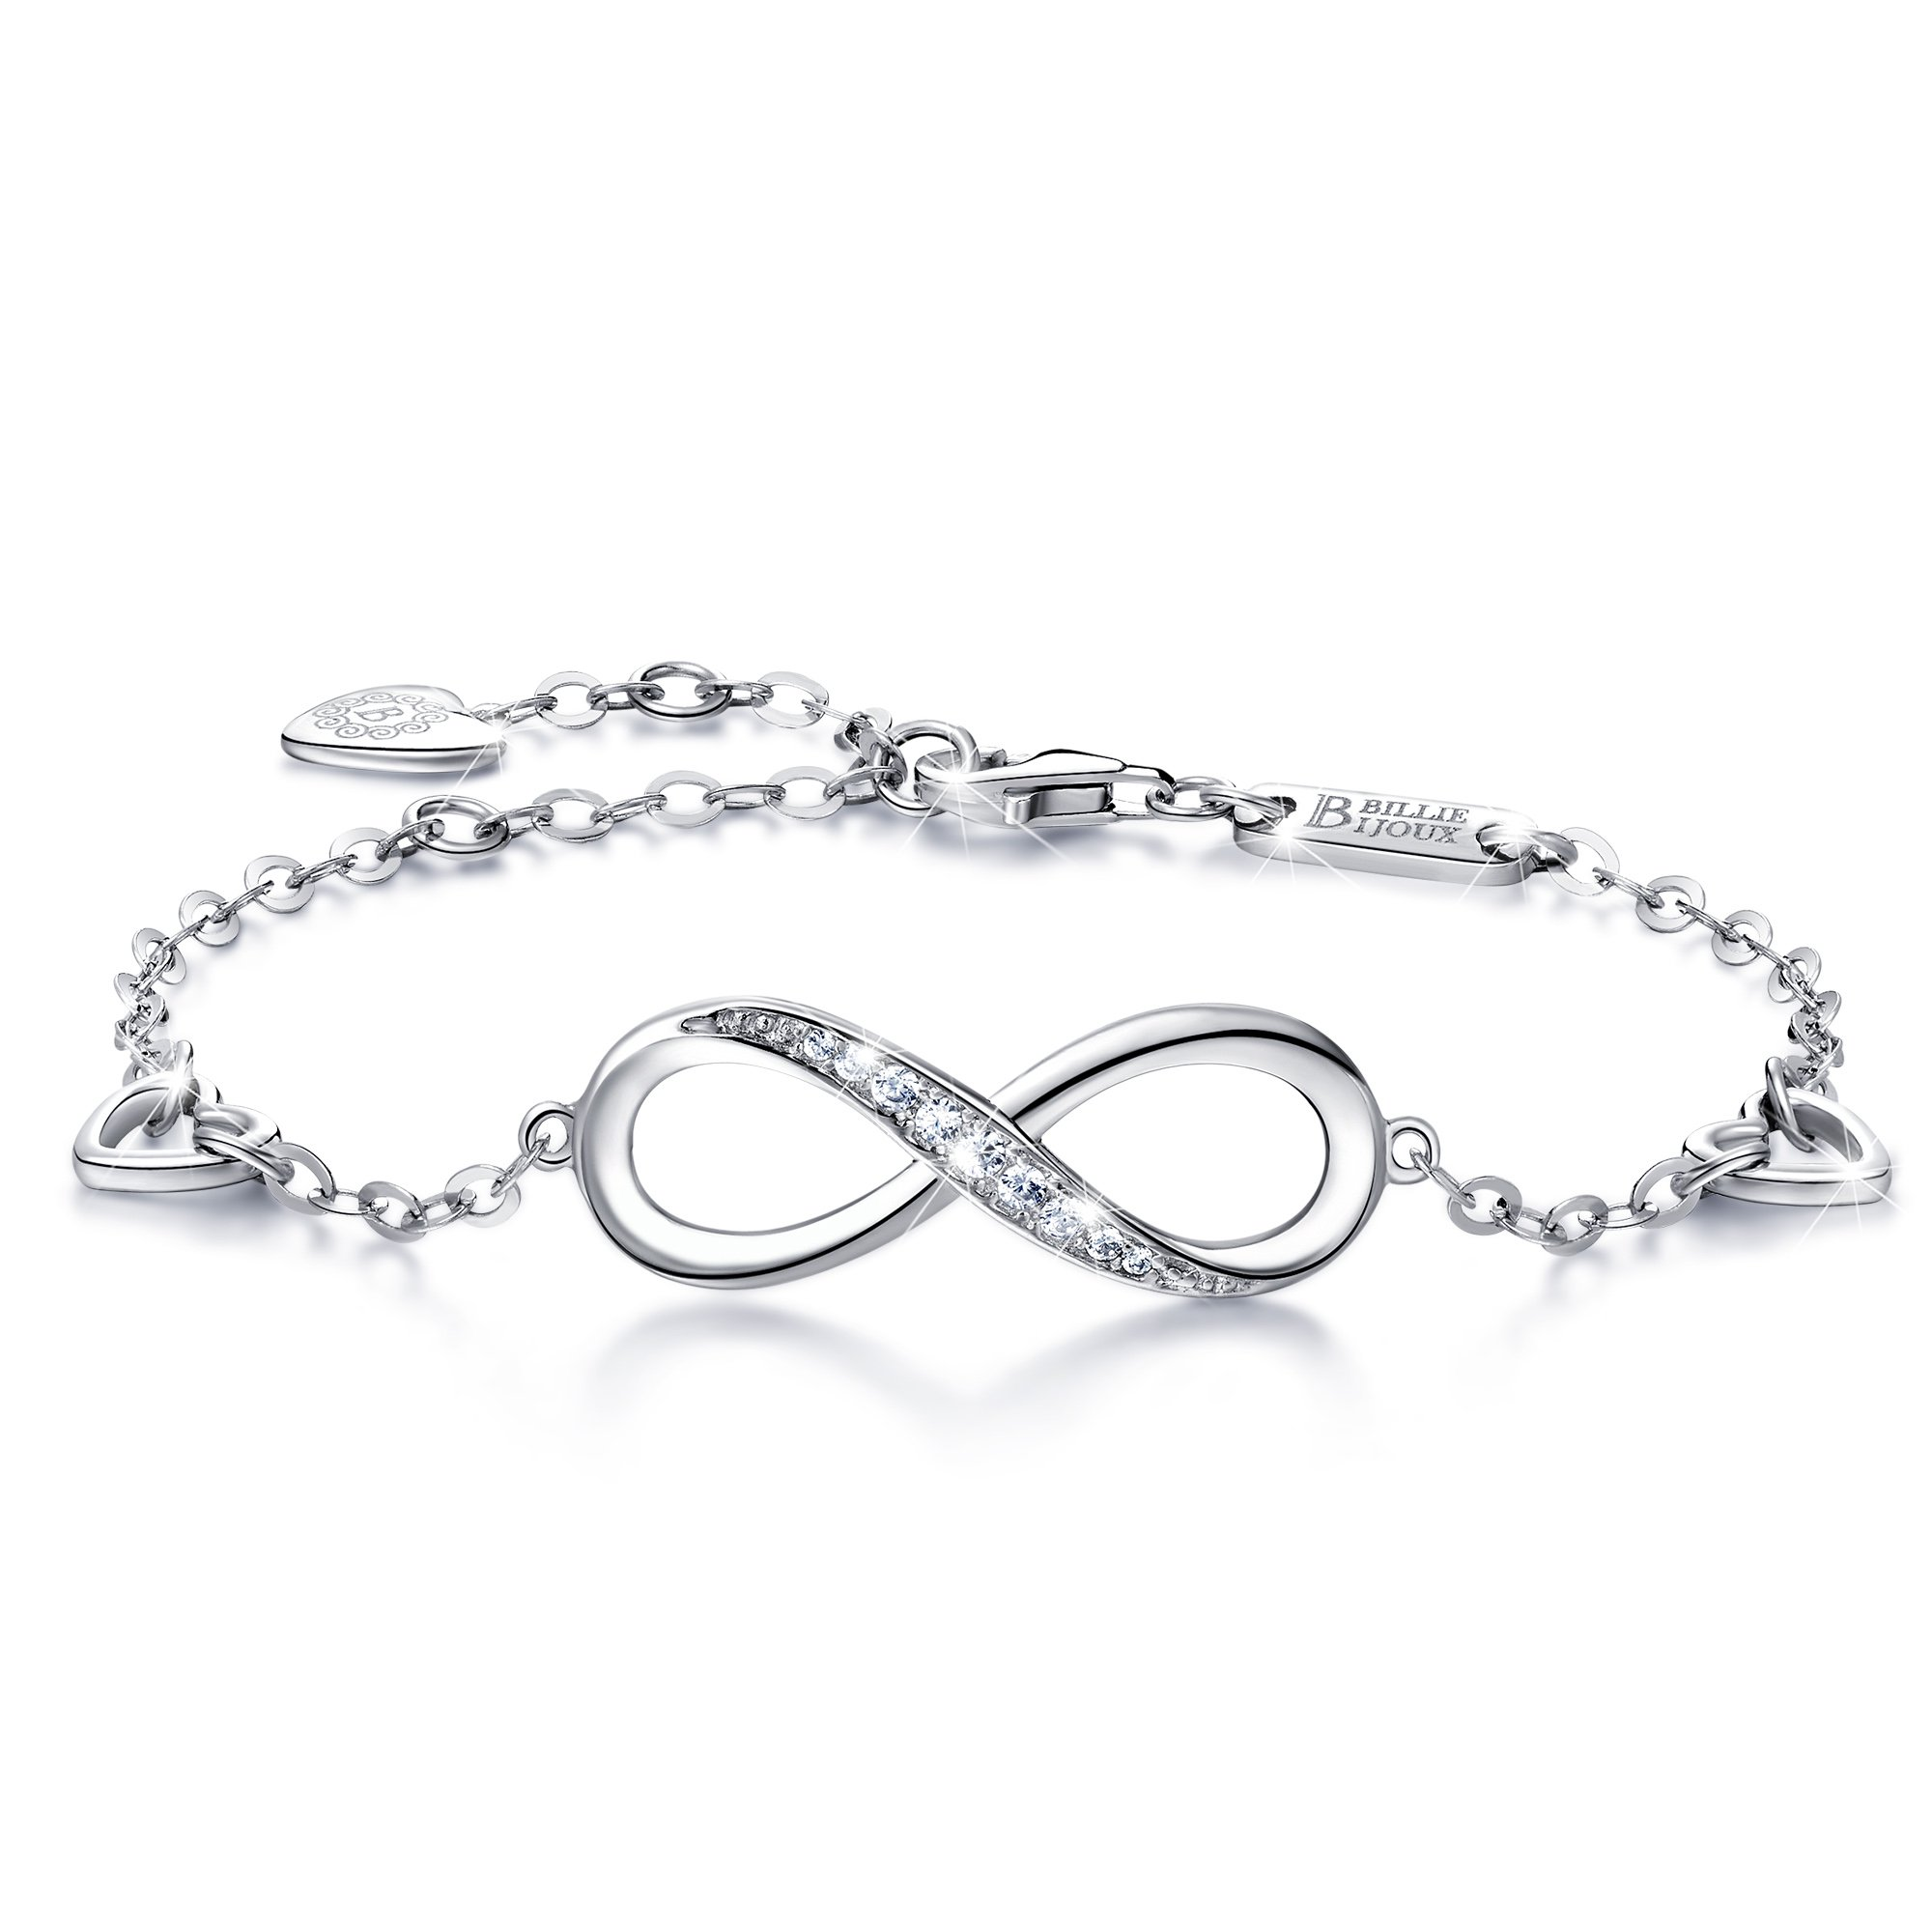 Billie Bijoux Womens 925 Sterling Silver Infinity Endless Love Symbol Charm Adjustable Bracelet Gift for Women Girls (A- Silver)